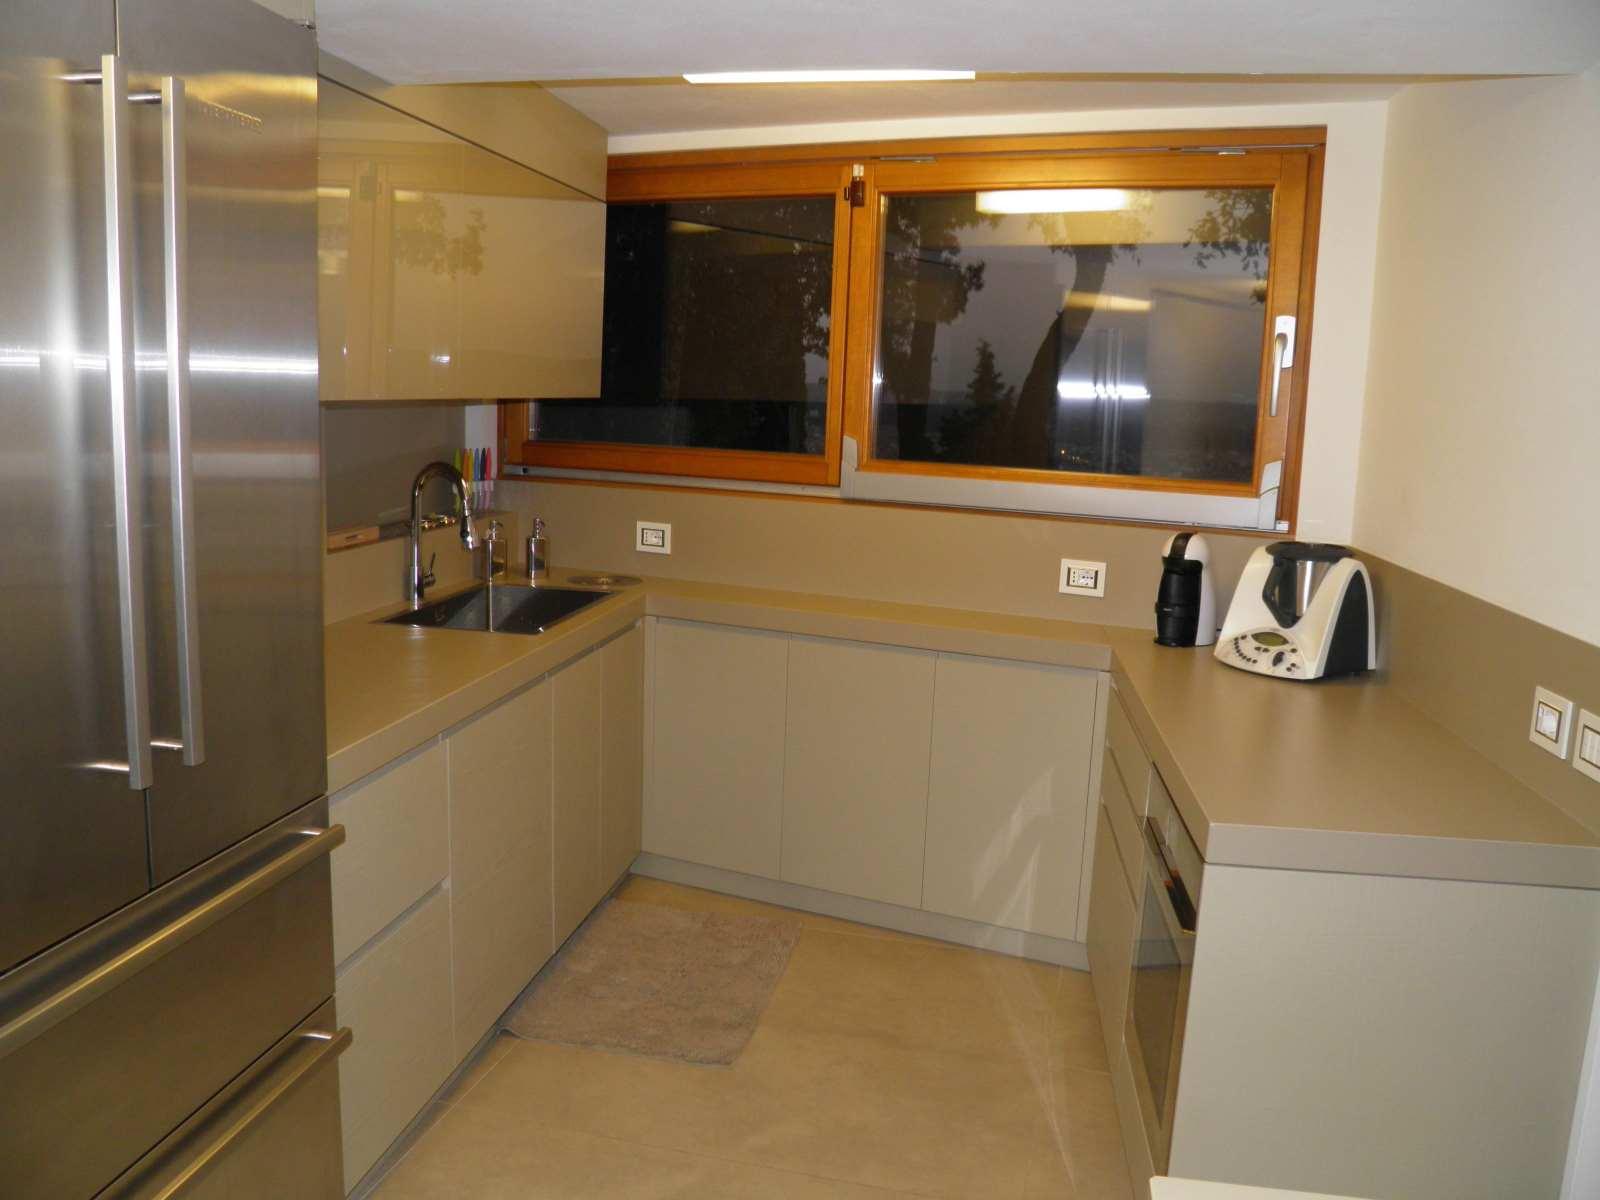 Cucina moderna su misura falegnameria ratoci - Mobili cucina su misura ...